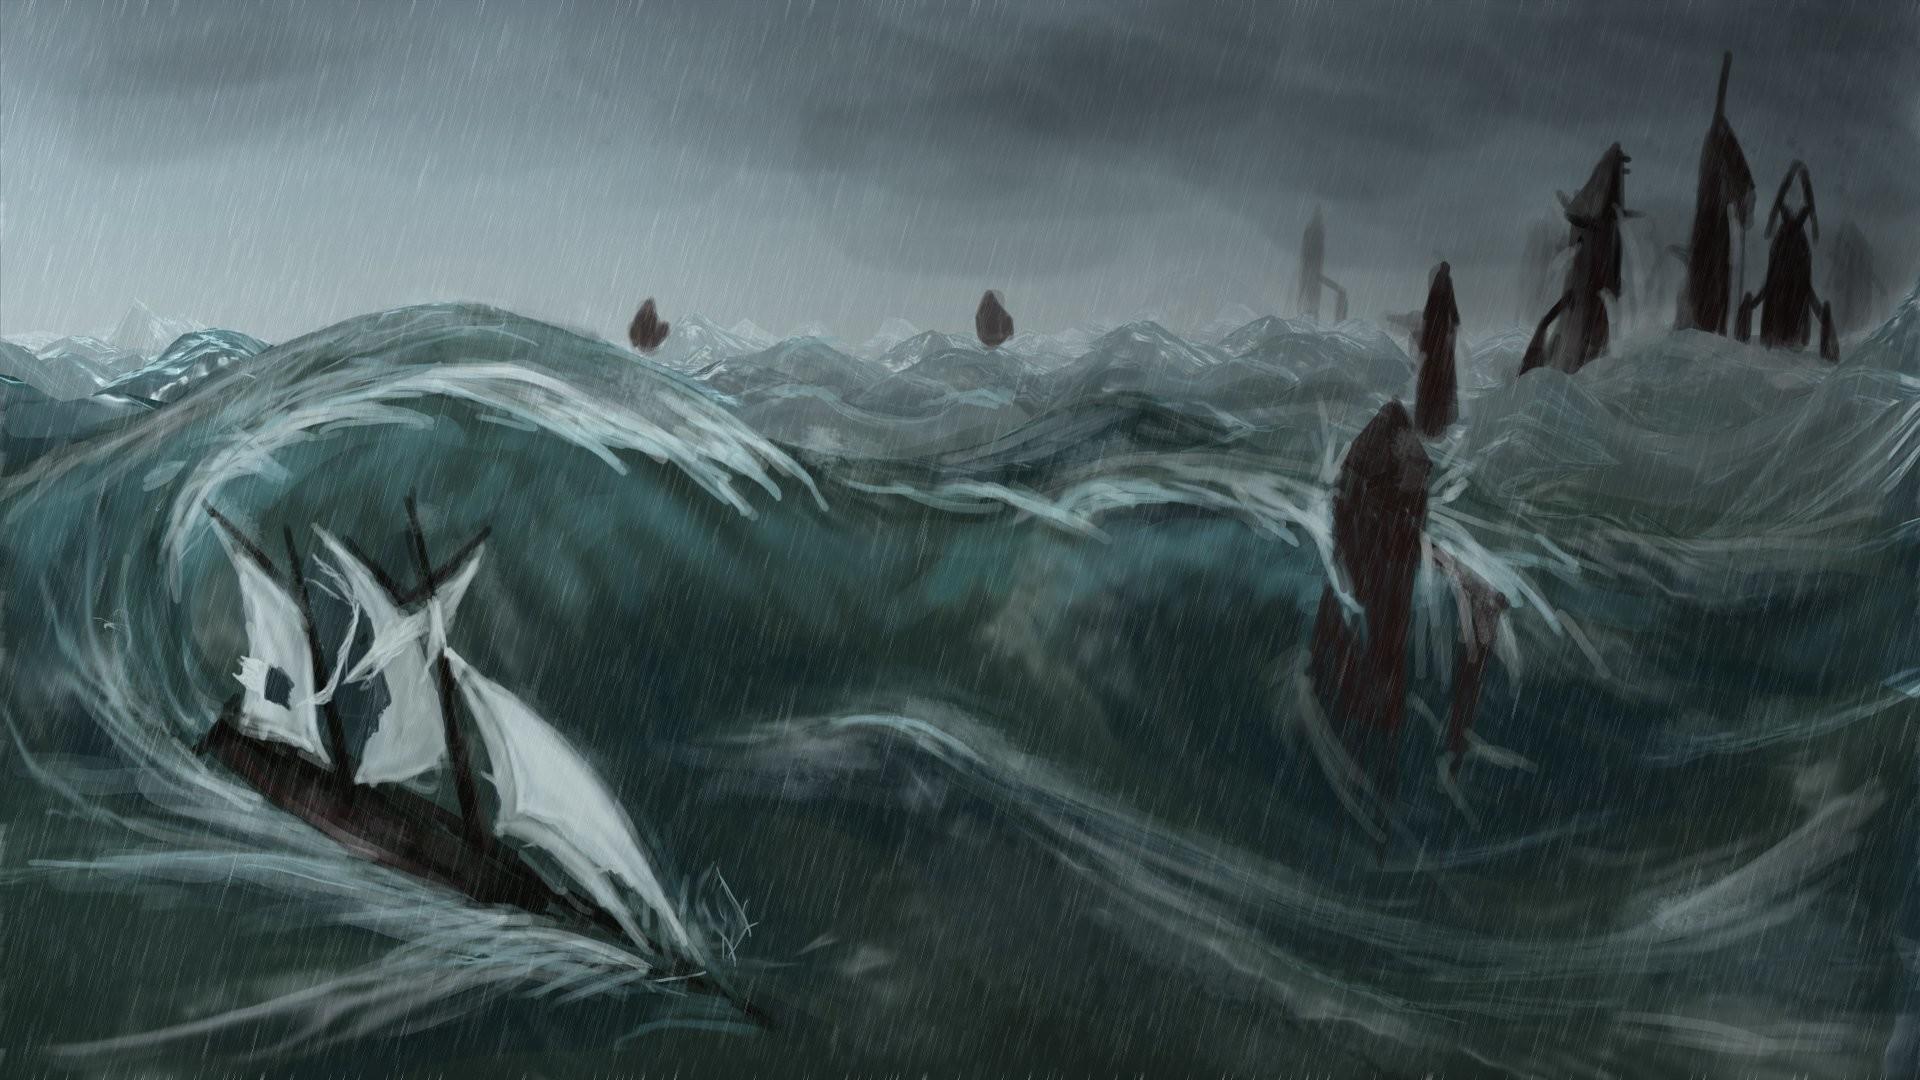 CALL-OF-CTHULHU horror rpg survival shooter call cthulhu fantasy wallpaper  | | 392967 | WallpaperUP